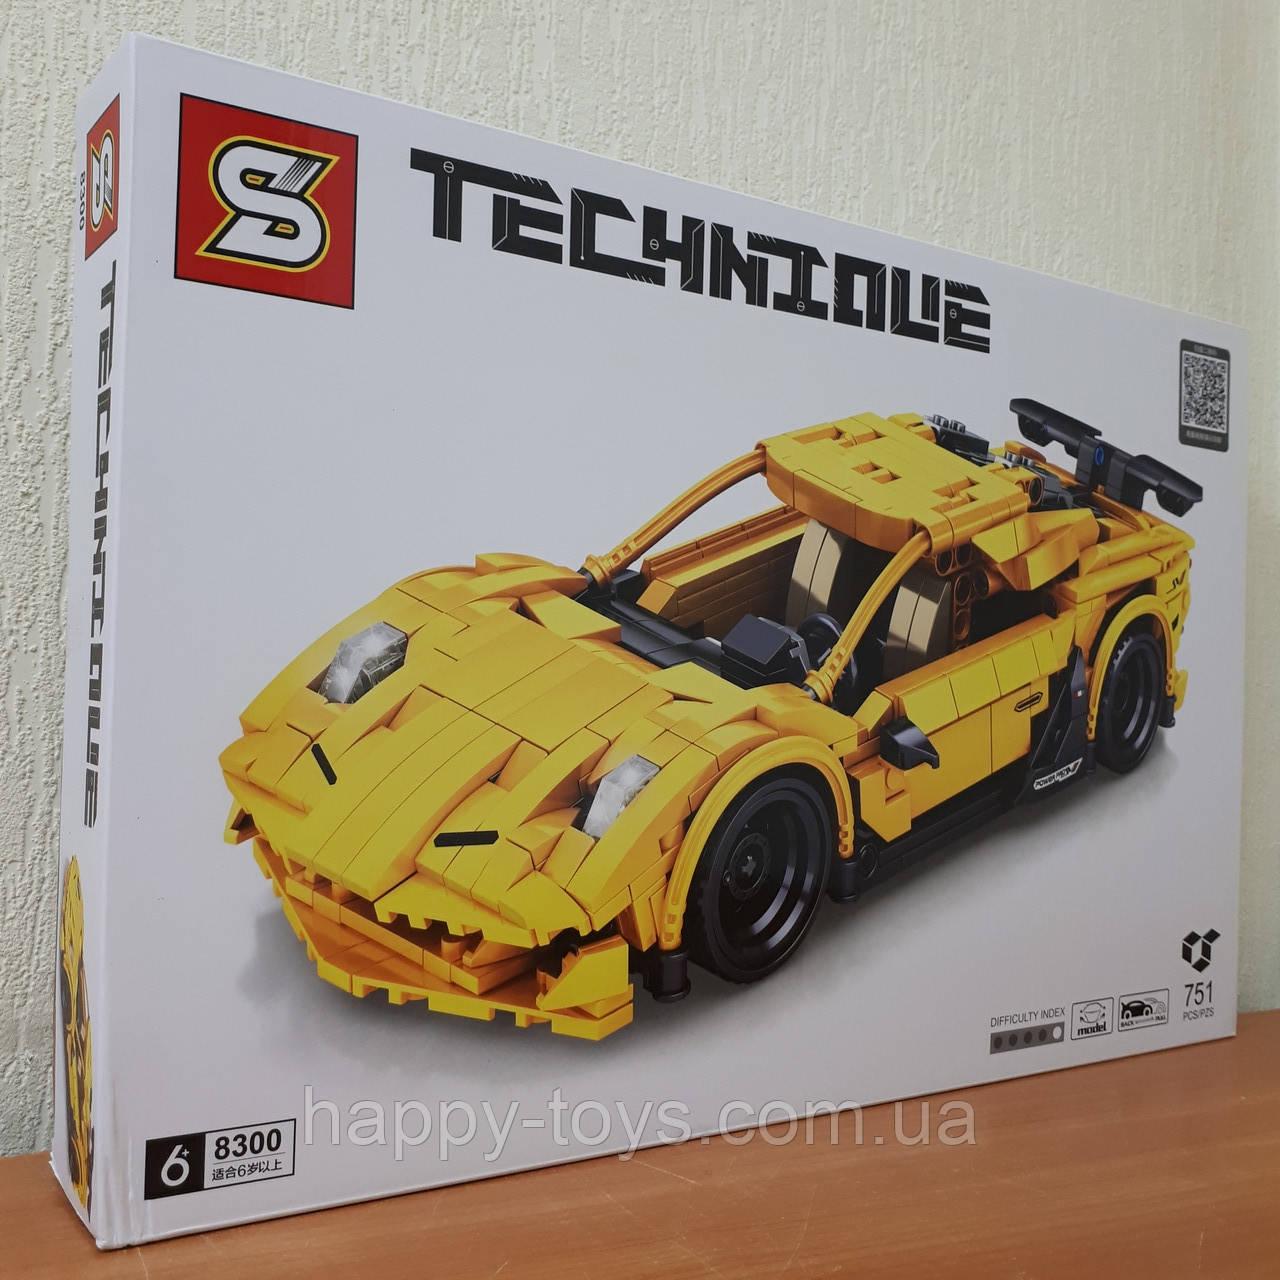 Конструктор Lamborghini Aventador Ламборджини Sembo Block 8300 Техник 751 деталь